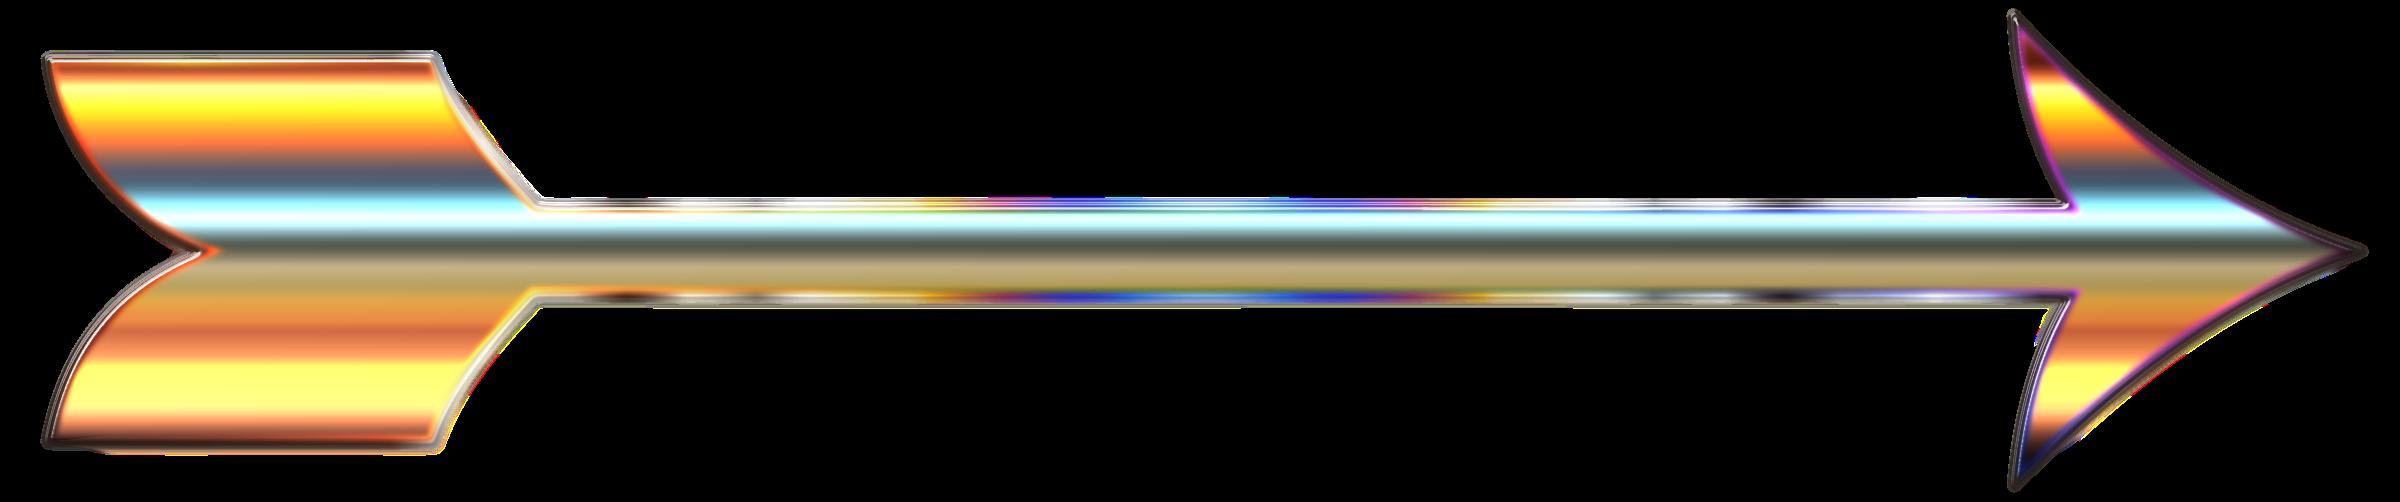 Arrow clipart with no background vector library stock Clipart - Chromatic Arrow Enhanced 2 No Background vector library stock